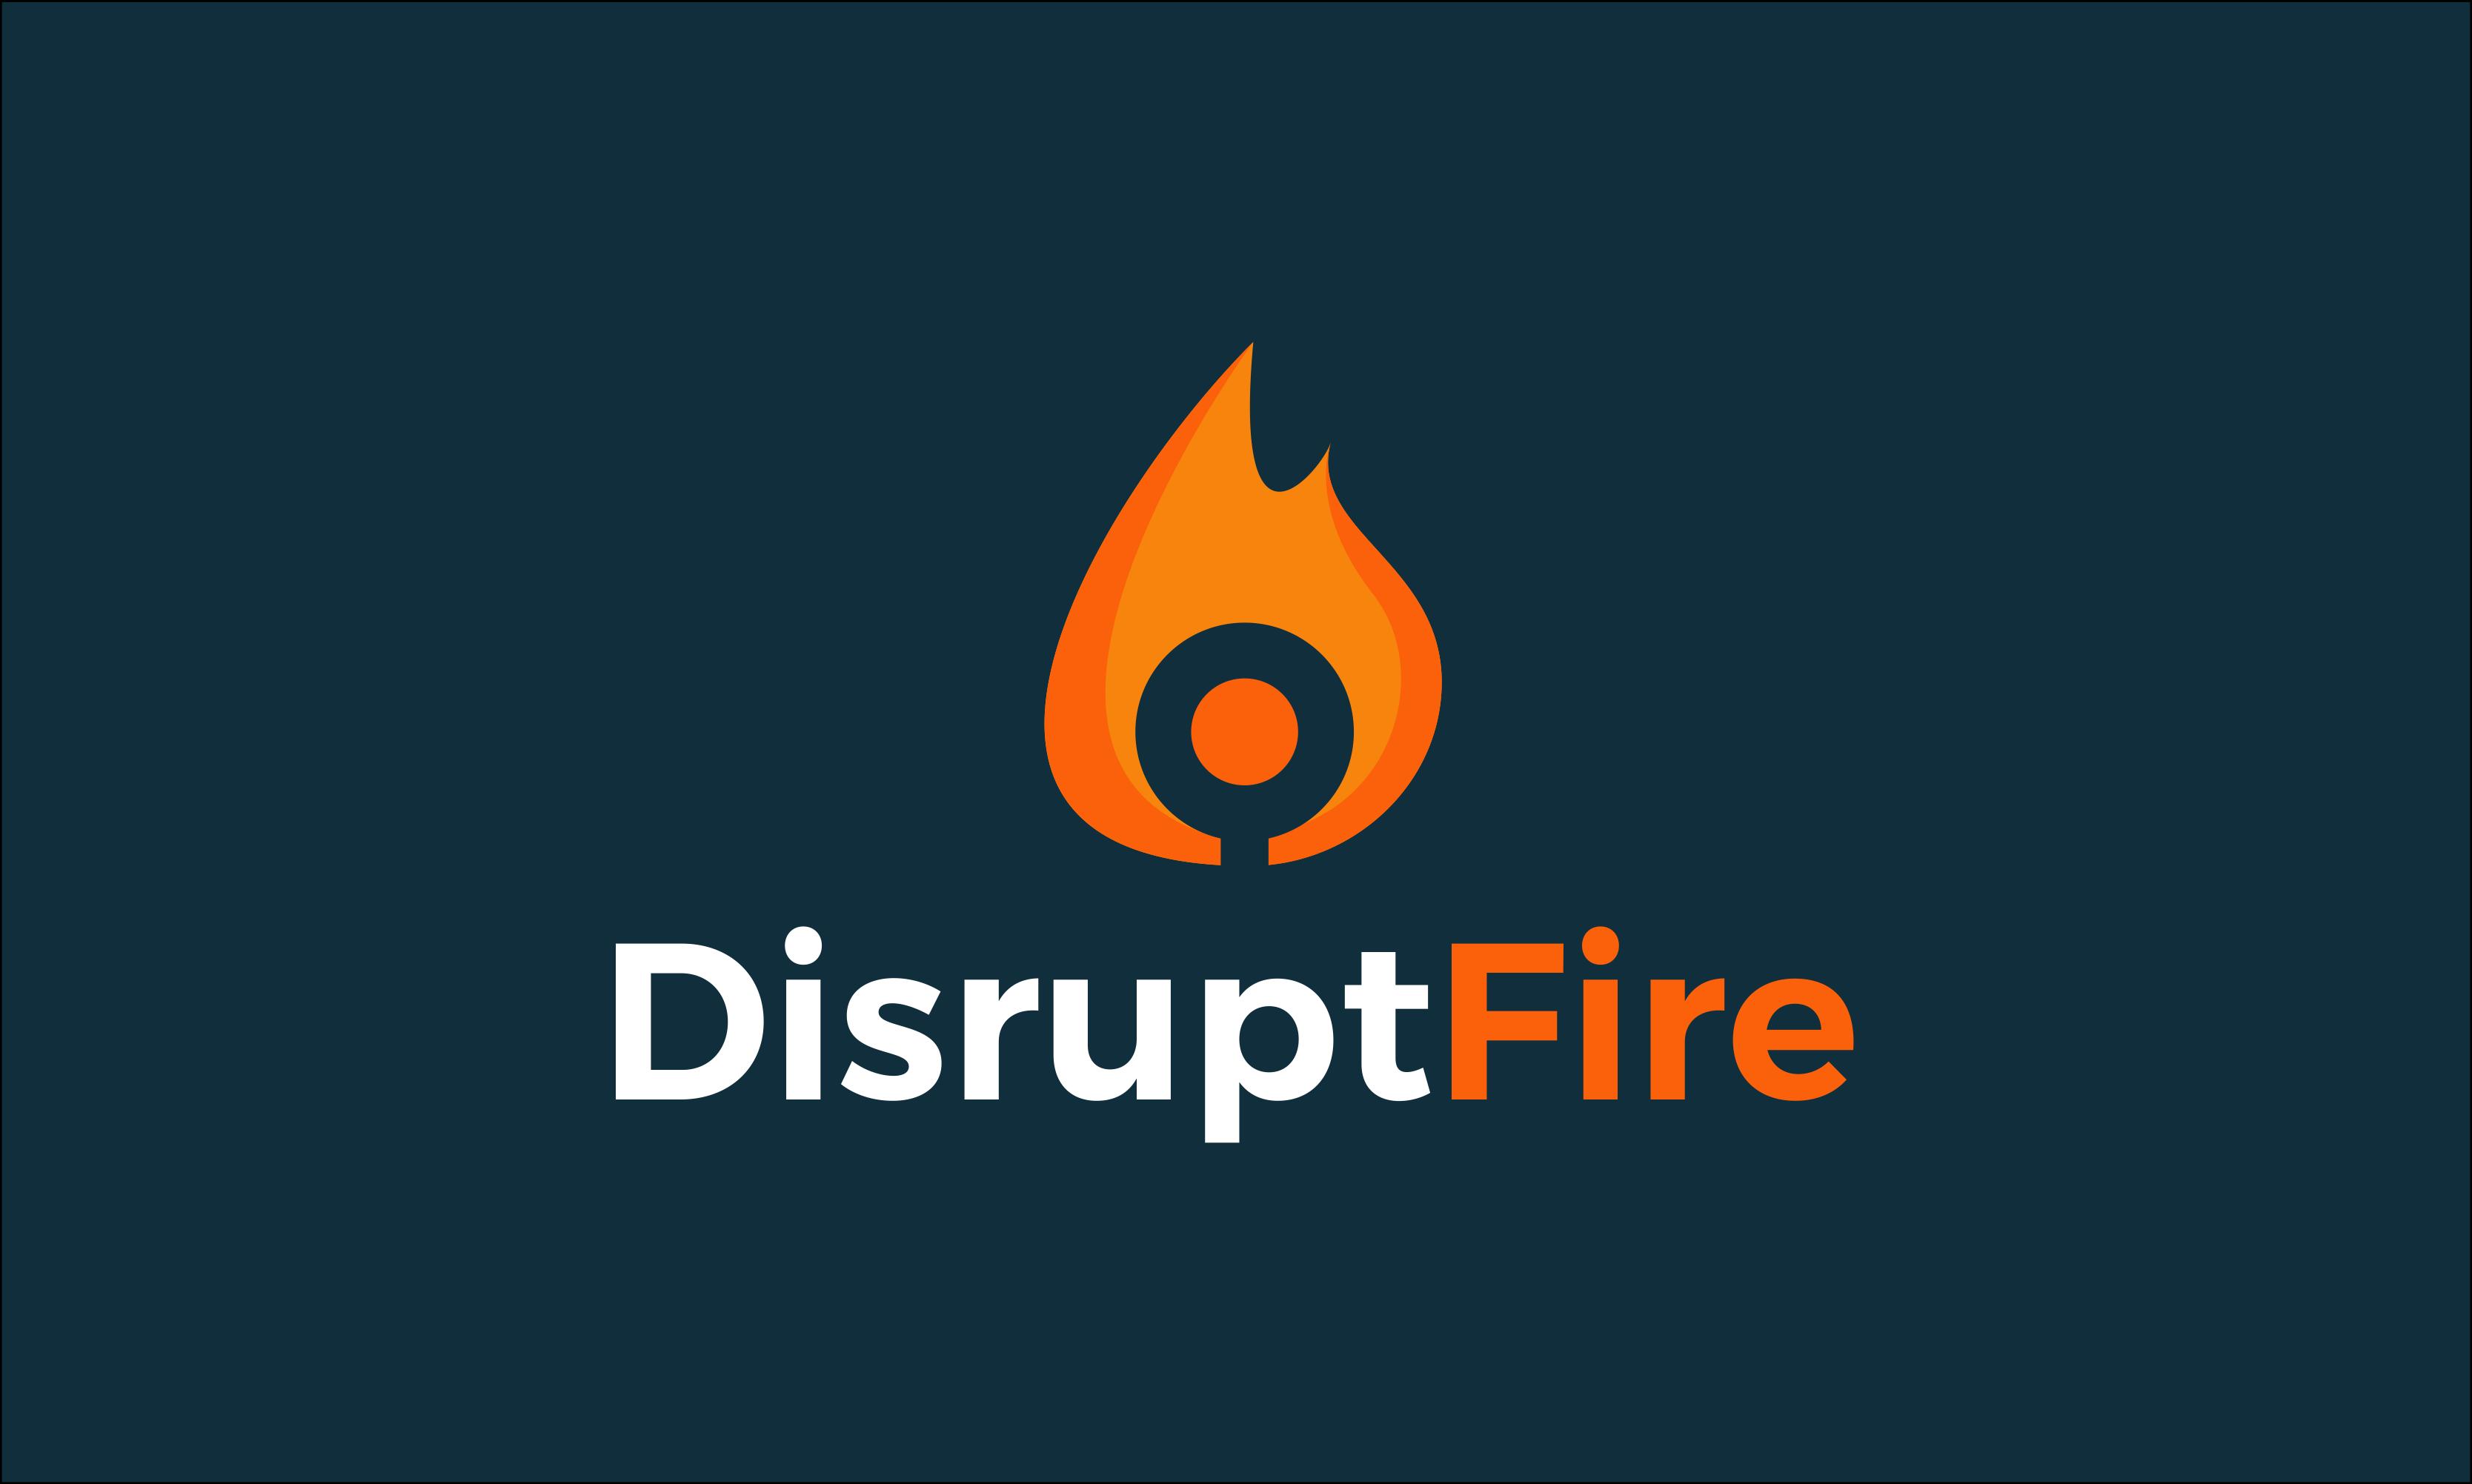 Disruptfire